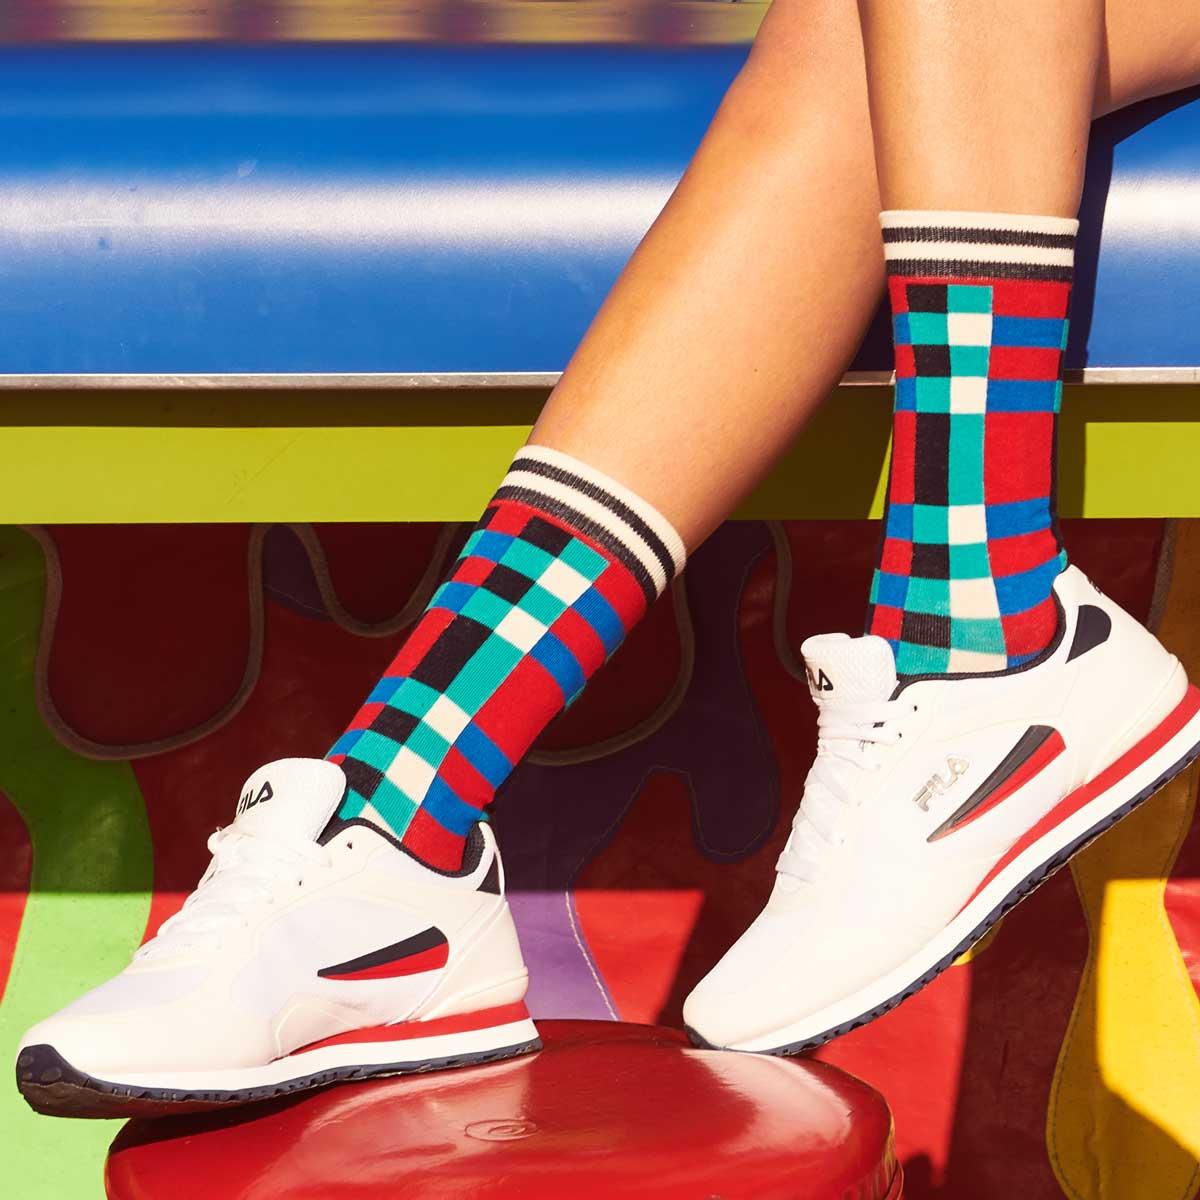 SS19-casual-socks.jpg